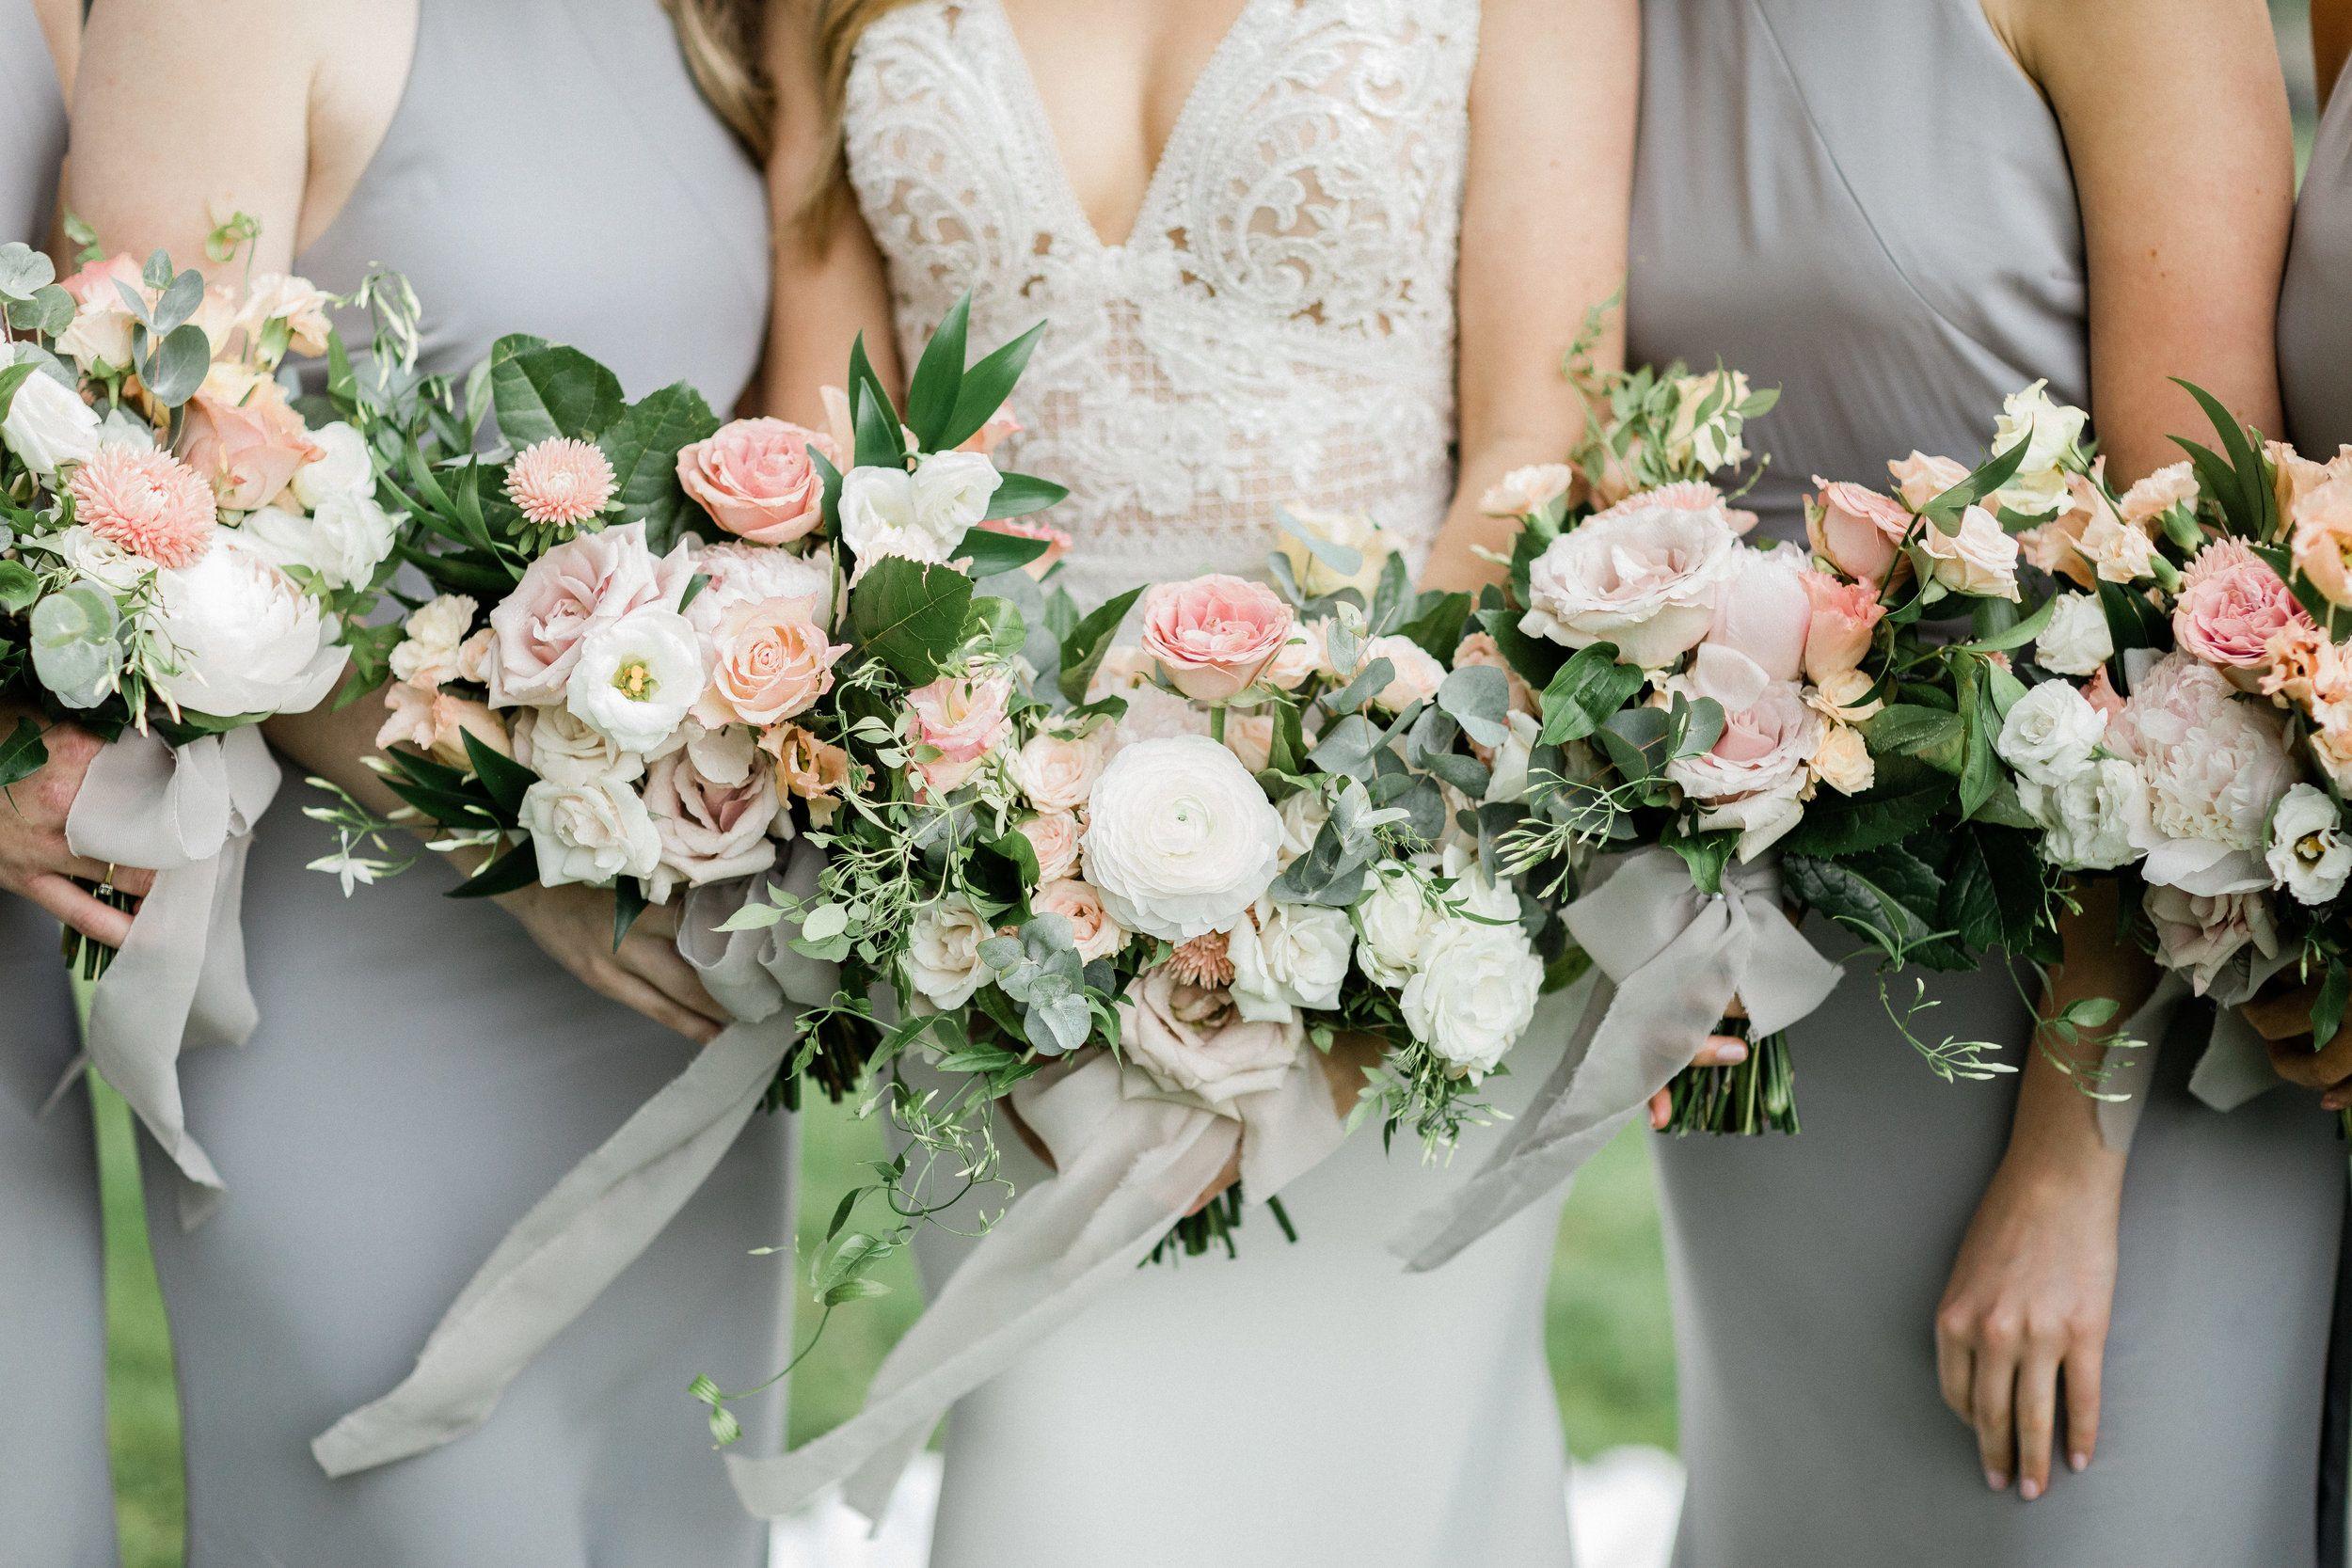 Bouquets By Designs By Ahn Cream Blush Pink Wedding Flowers